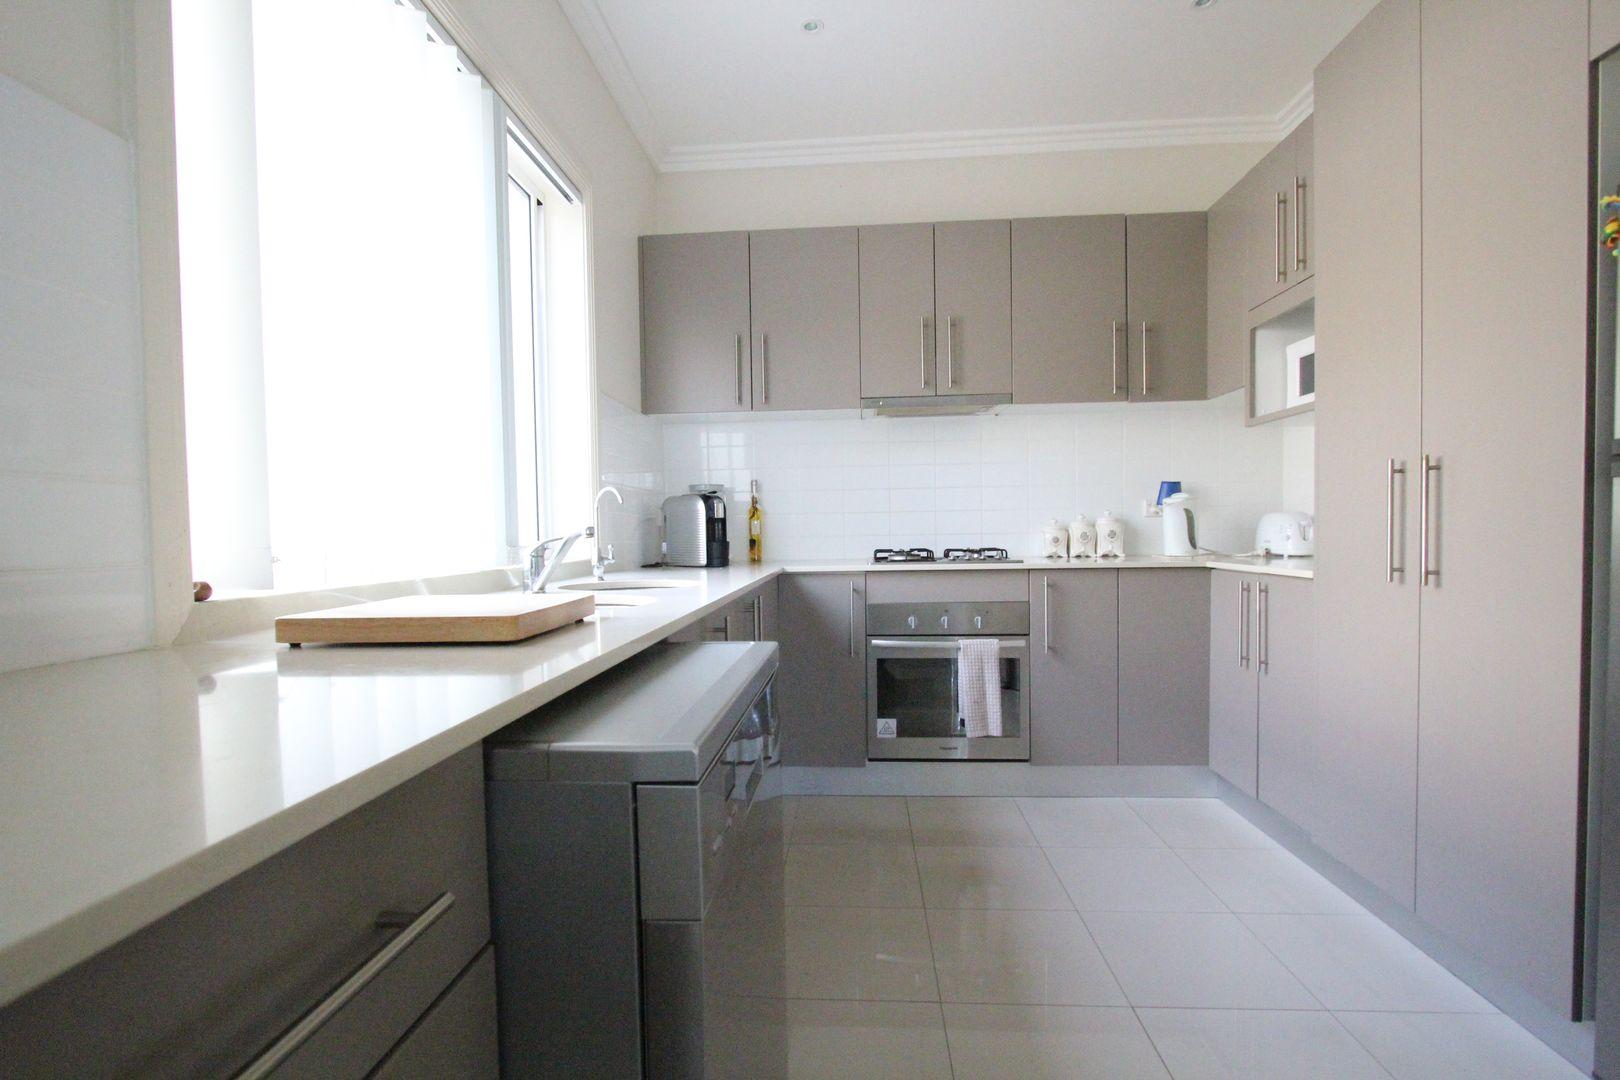 2A Harraden Drive, West Hoxton NSW 2171, Image 1